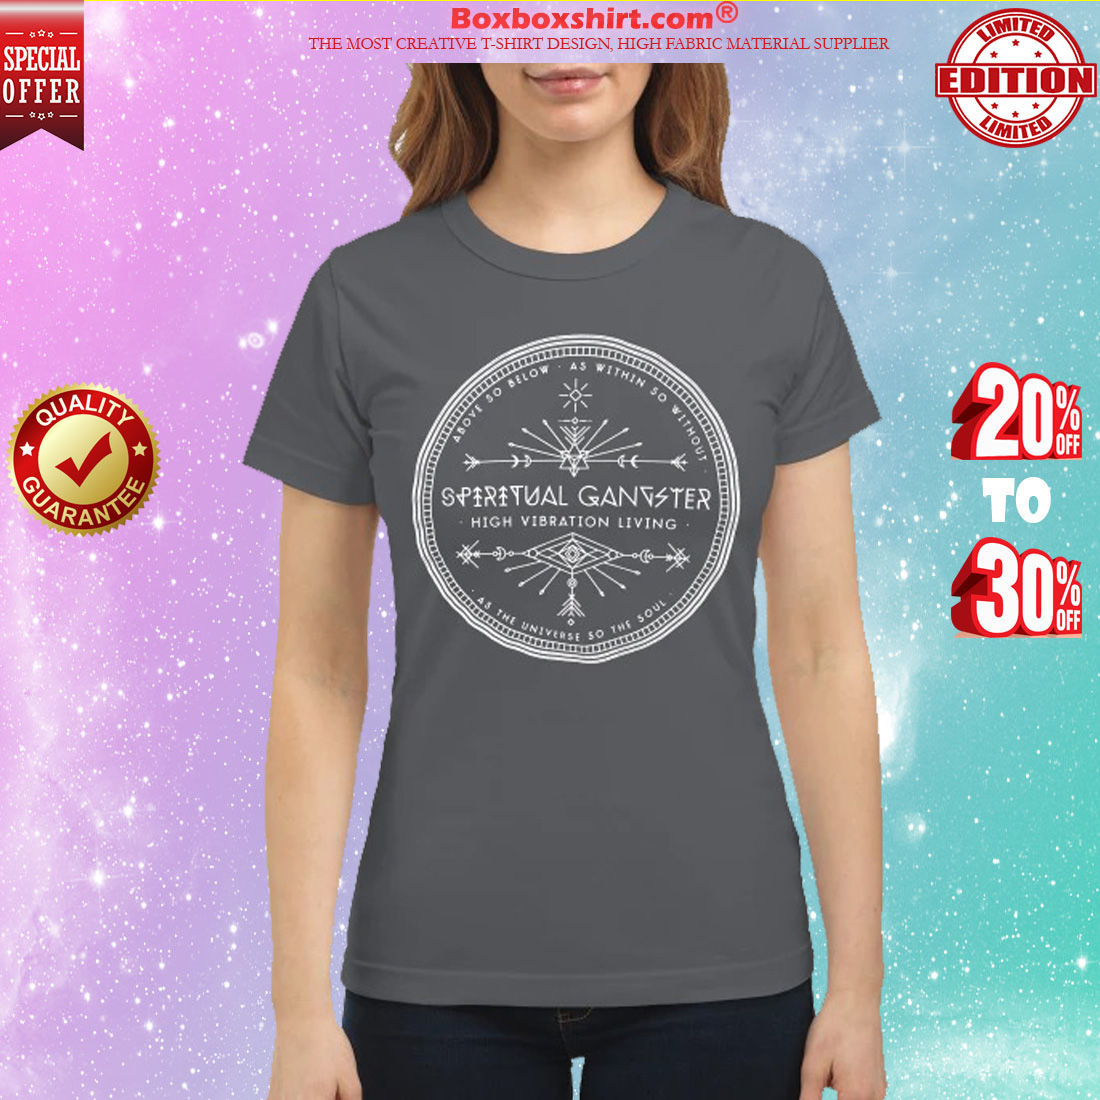 Spiritual gangster high vibration living classic shirt